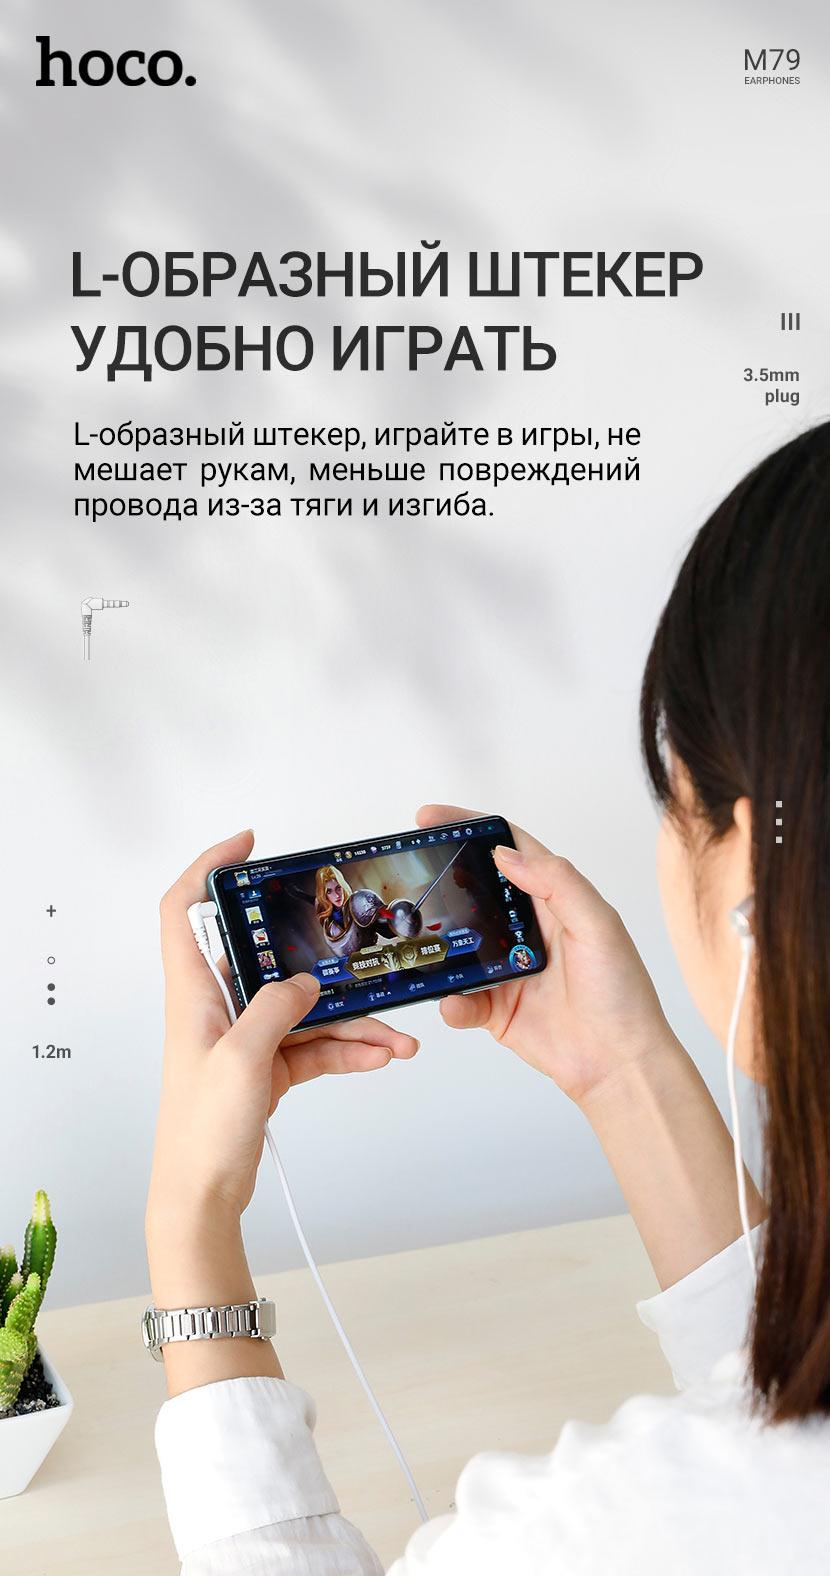 hoco news m79 cresta universal earphones with microphone plug ru